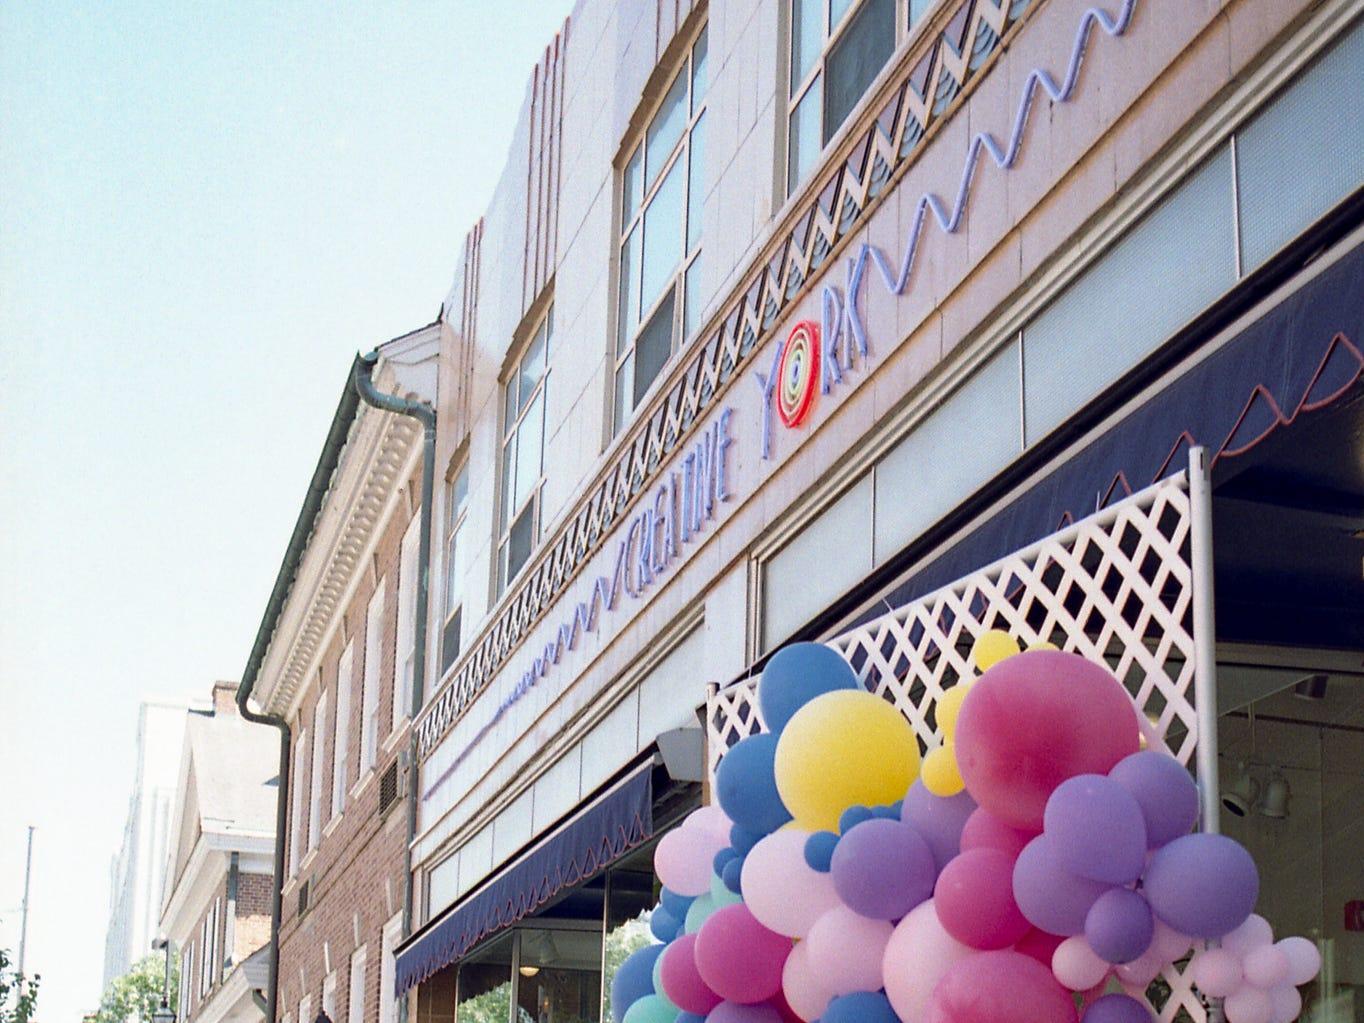 Filling balloons at Creative York. [Pentax KX] [Kodak ProImage 100]